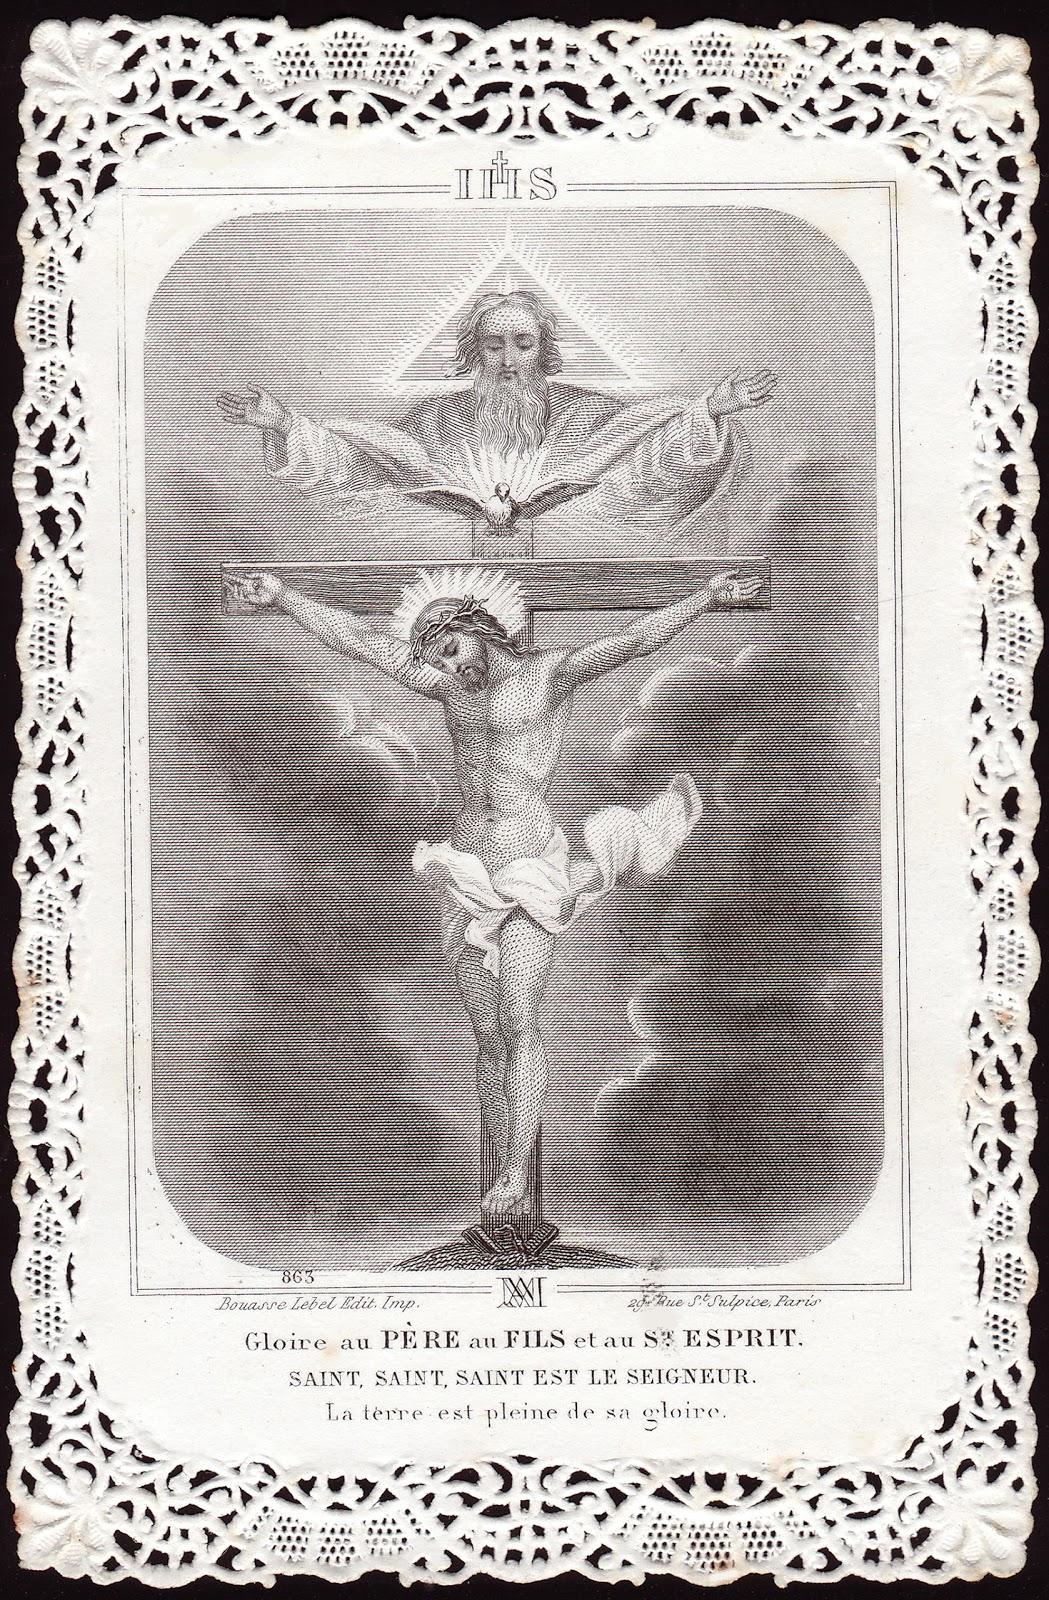 Father son holy spirit symbol gallery symbol and sign ideas father son and holy spirit symbol choice image symbol and sign ideas the holy cross buycottarizona biocorpaavc